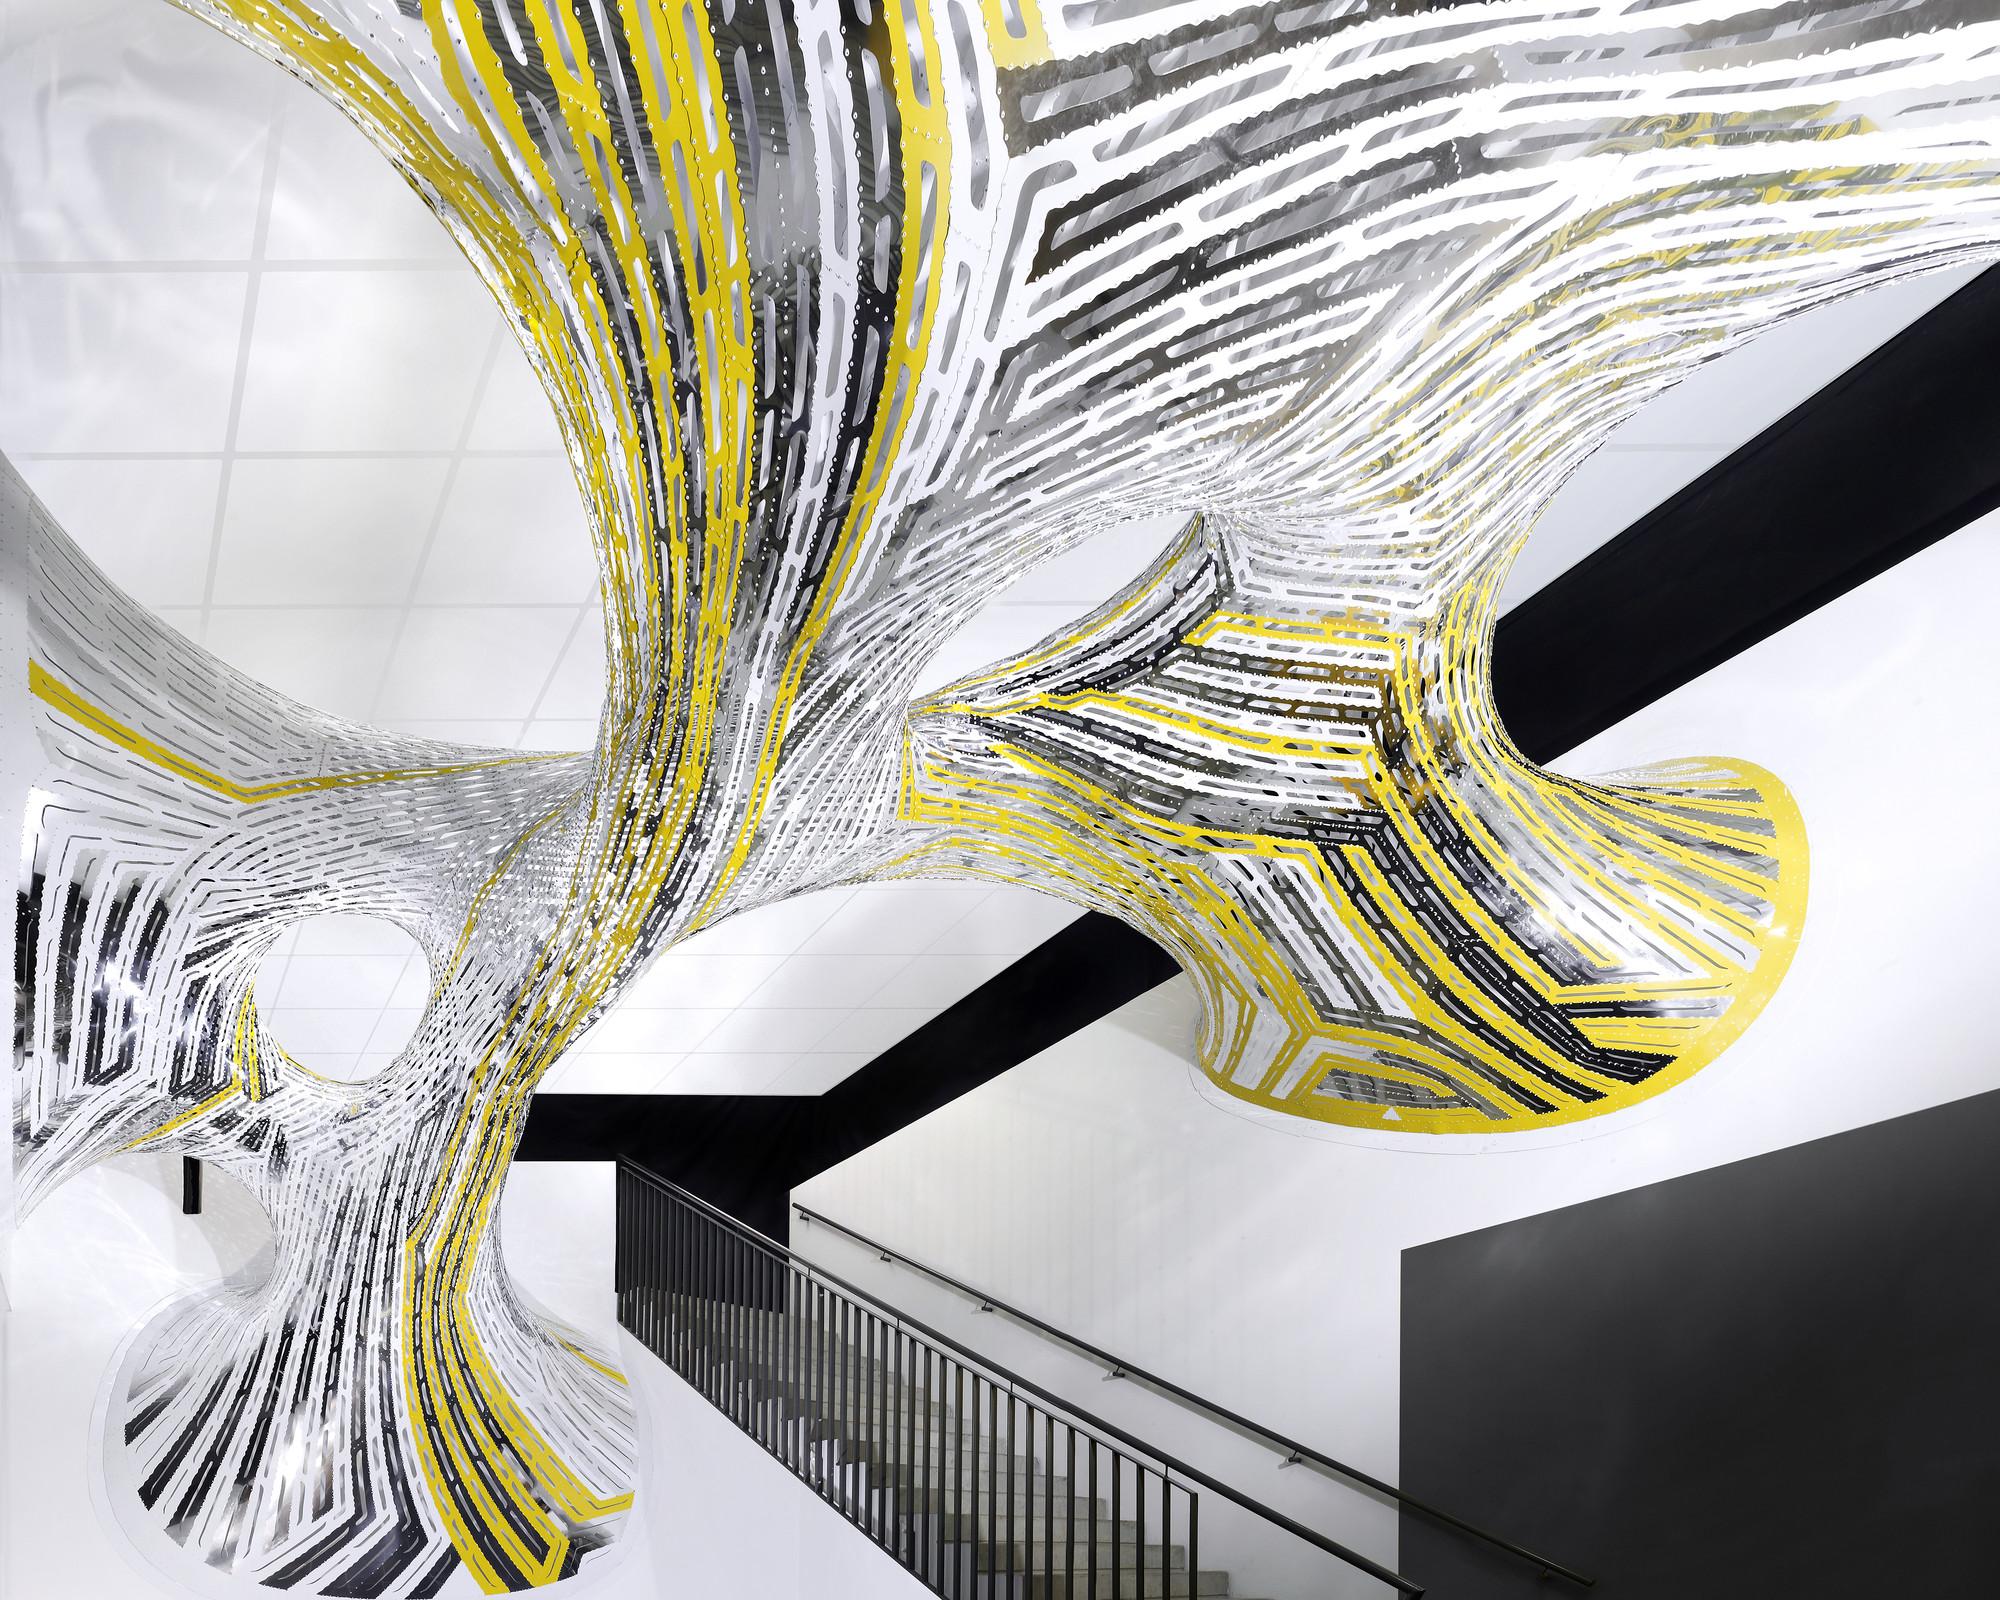 Marc Fornes / THEVERYMANY Installations Transform INRIA , © Marc Fornes / THEVERYMANY - Sous Tension